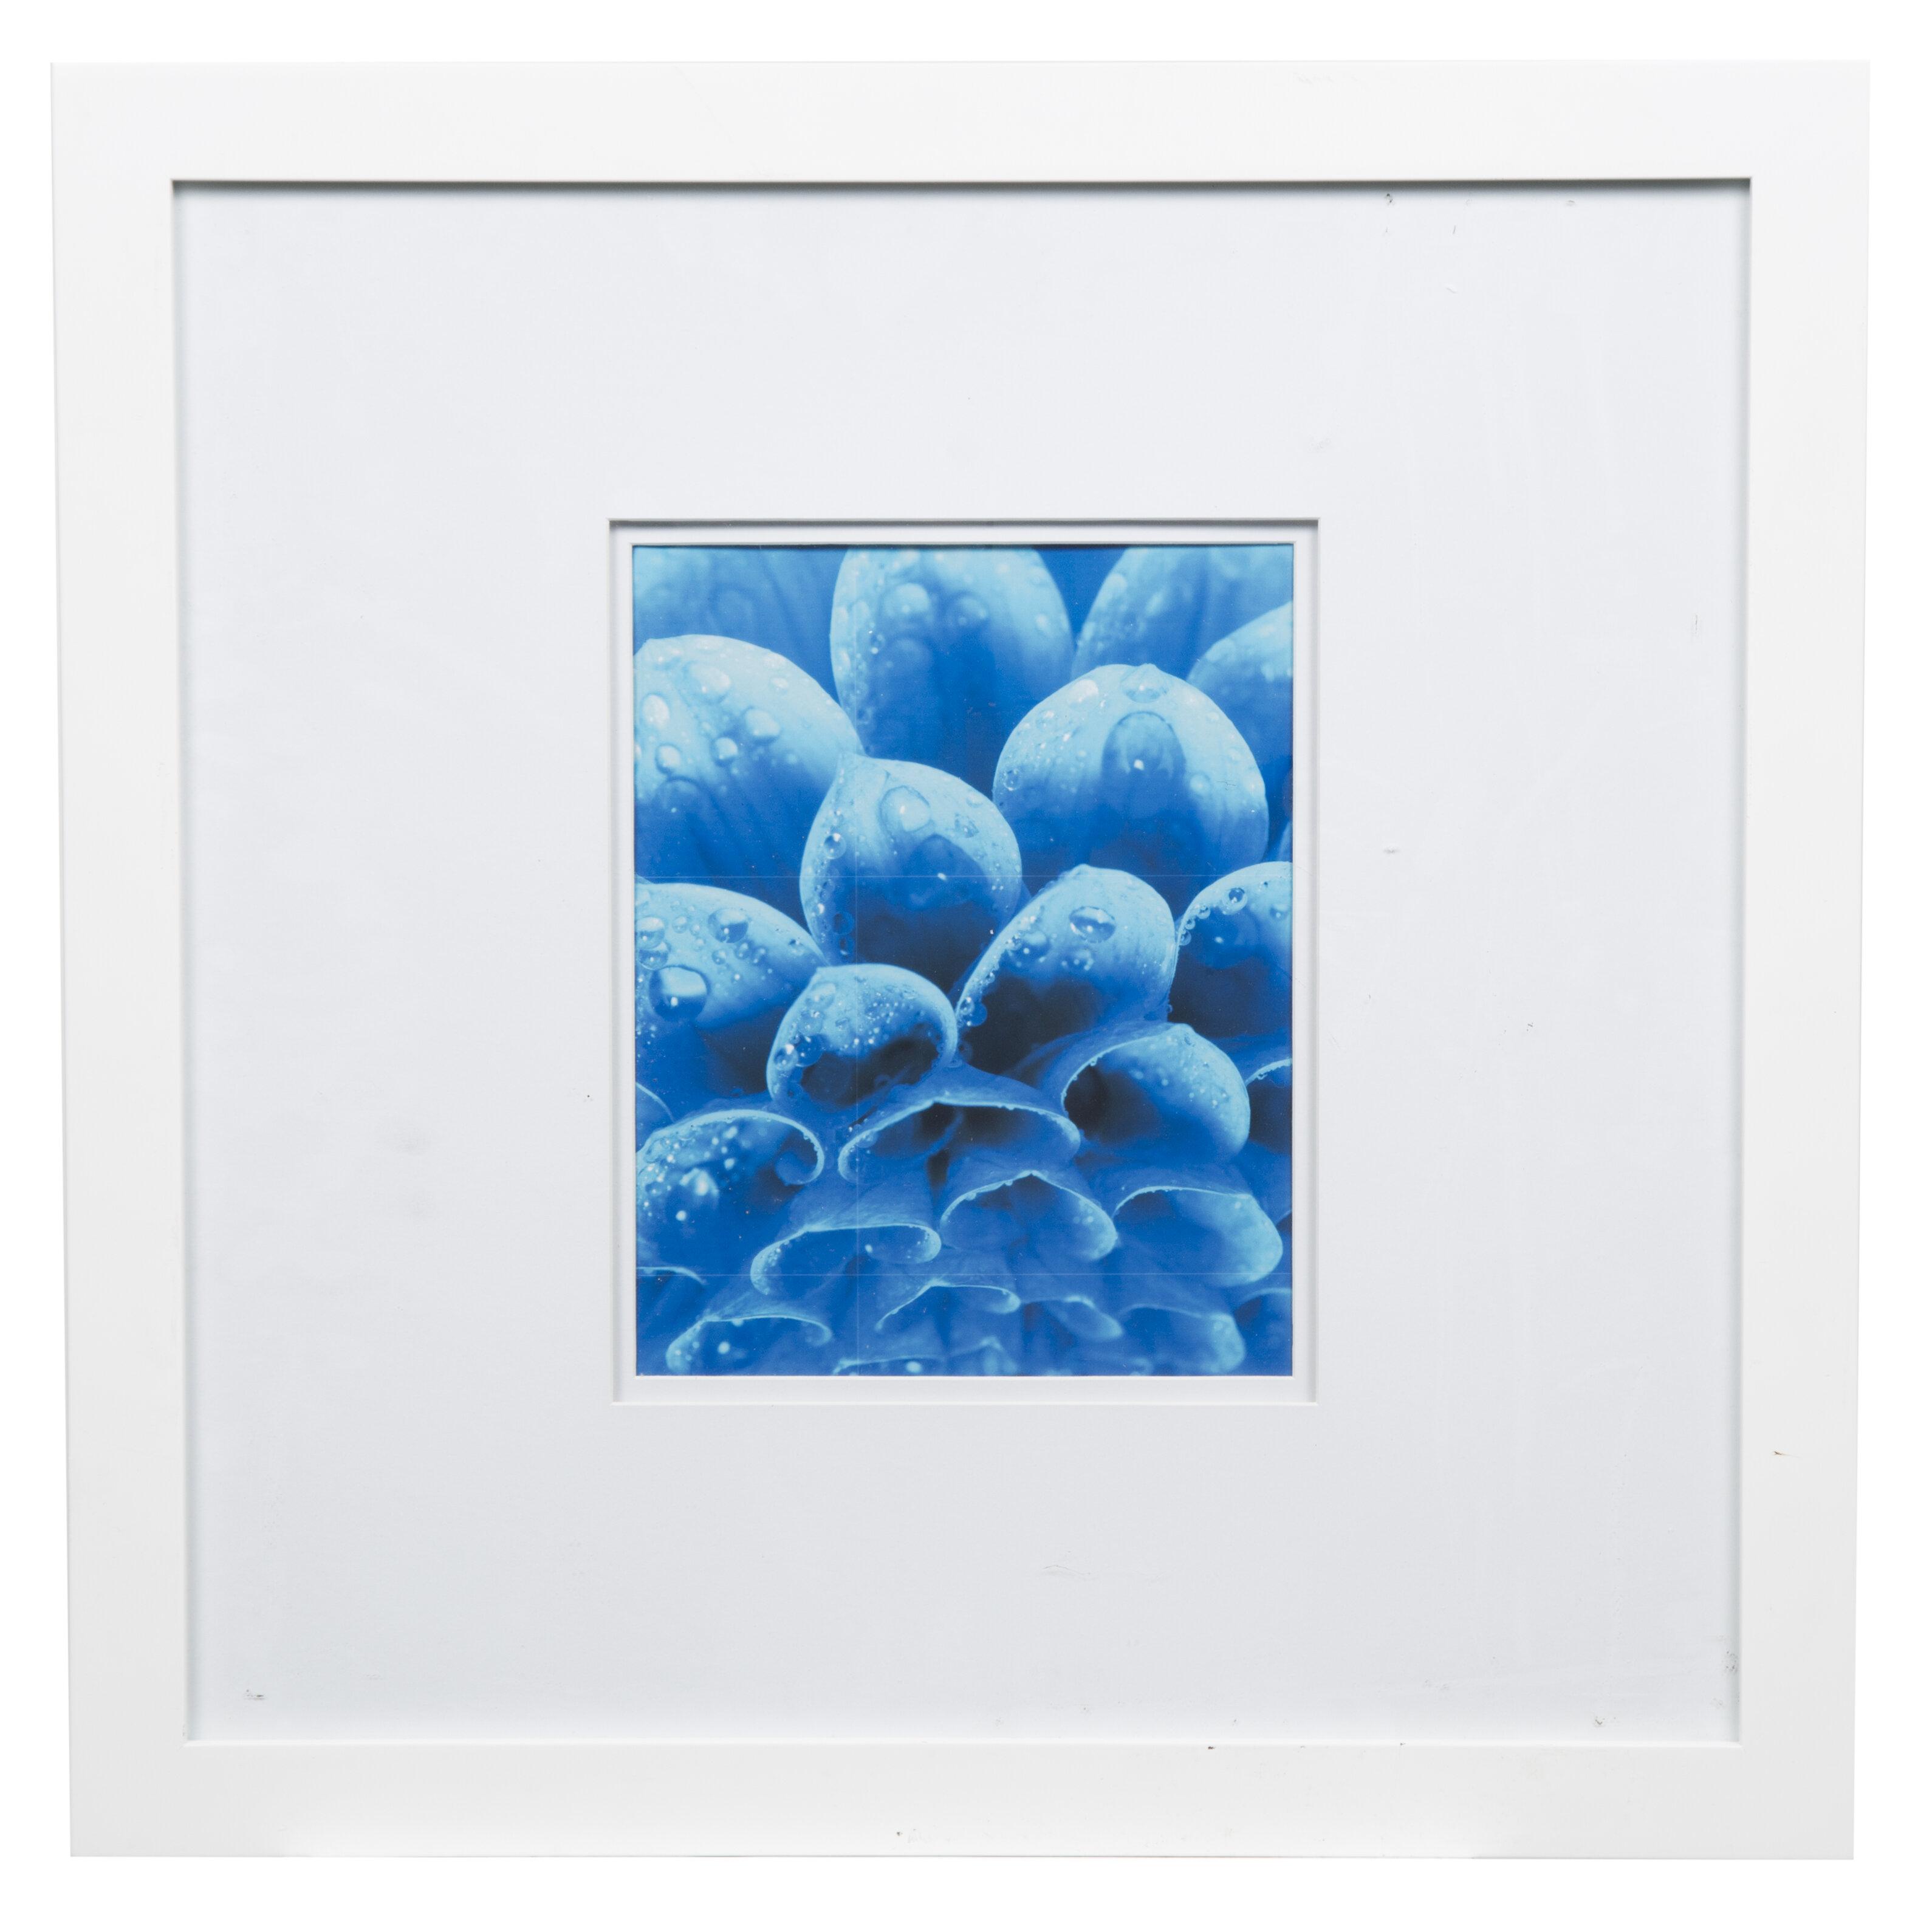 custom mats pin clemson for mat tigers photo frame picture frames